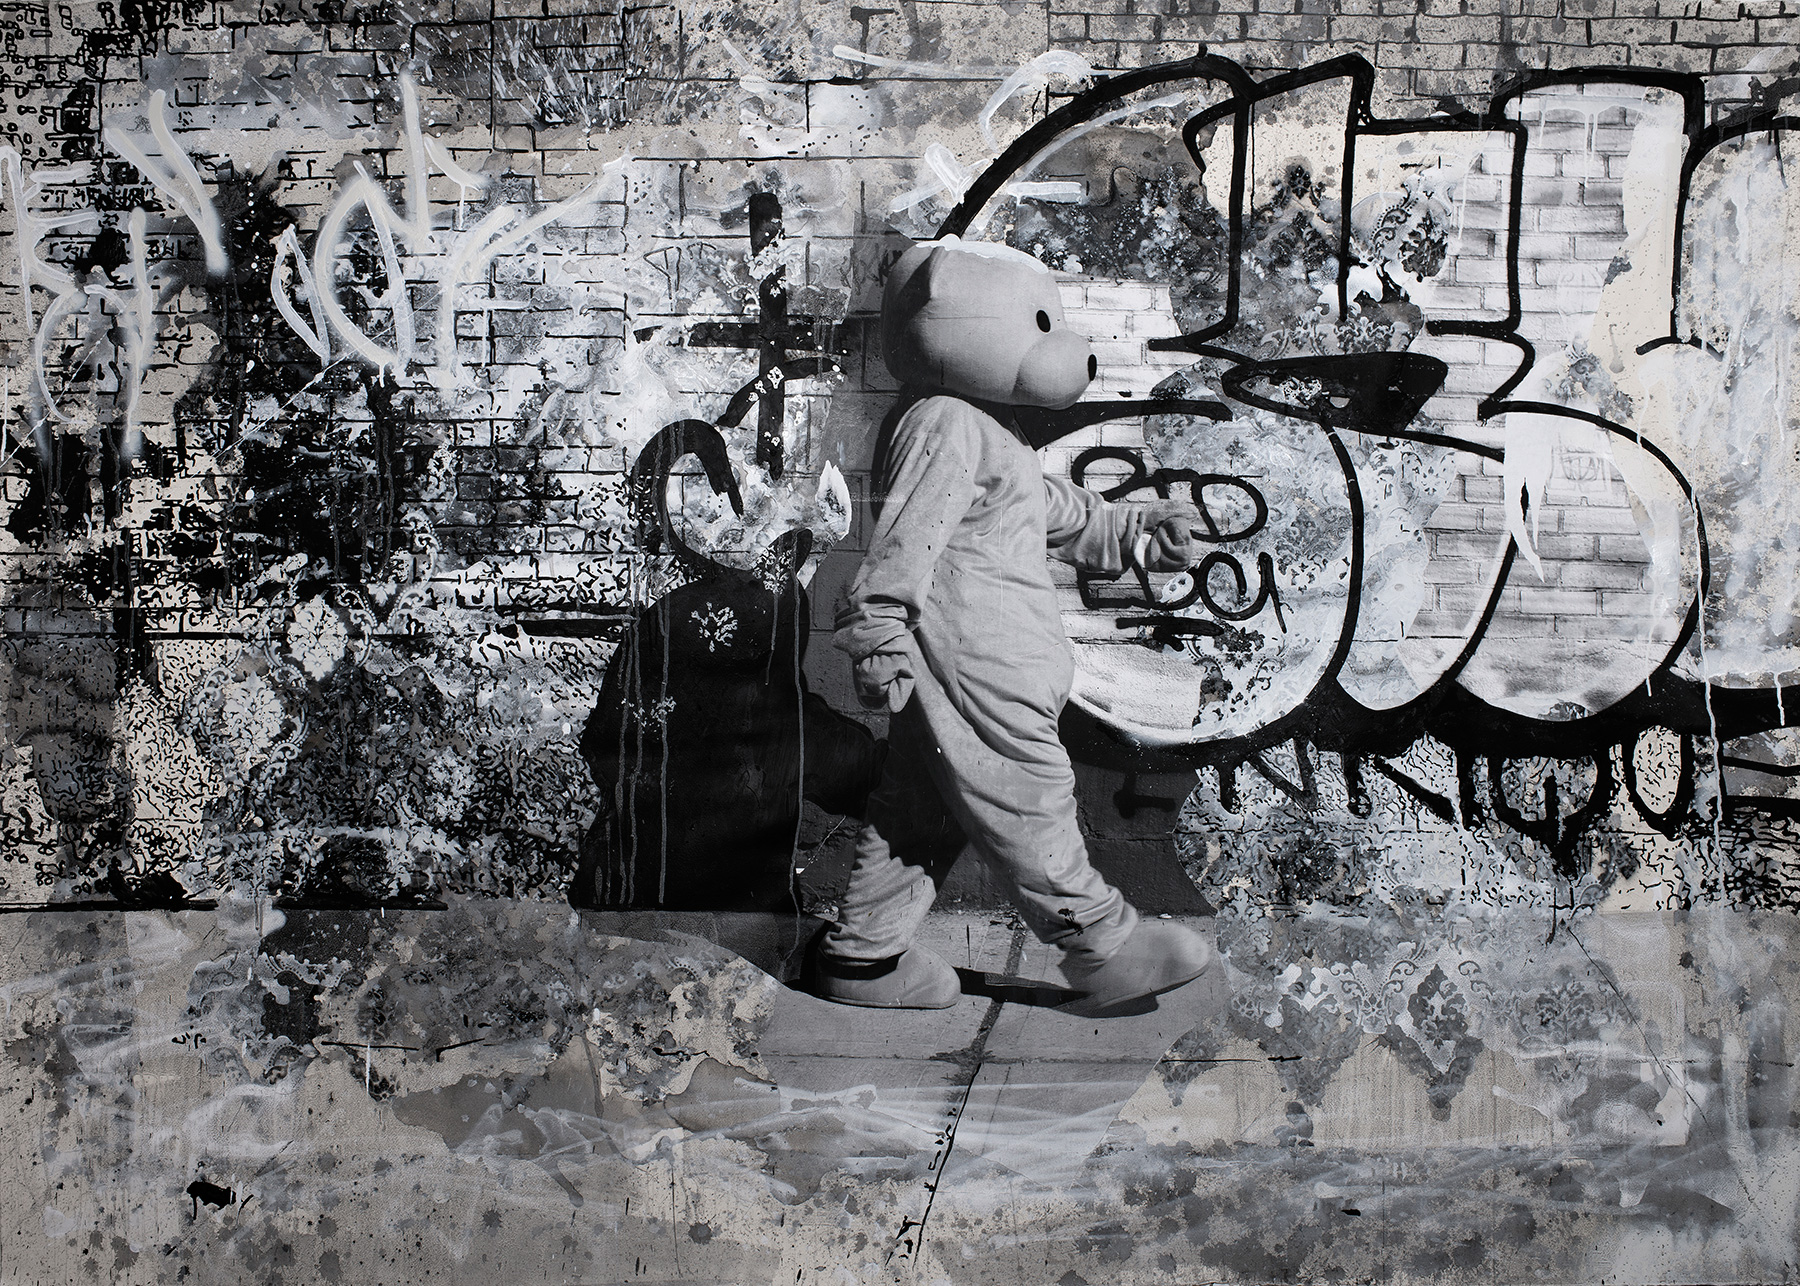 Pink Bear - New York - Acyrlic & Paper collage on Bockingford 300 gsm paper